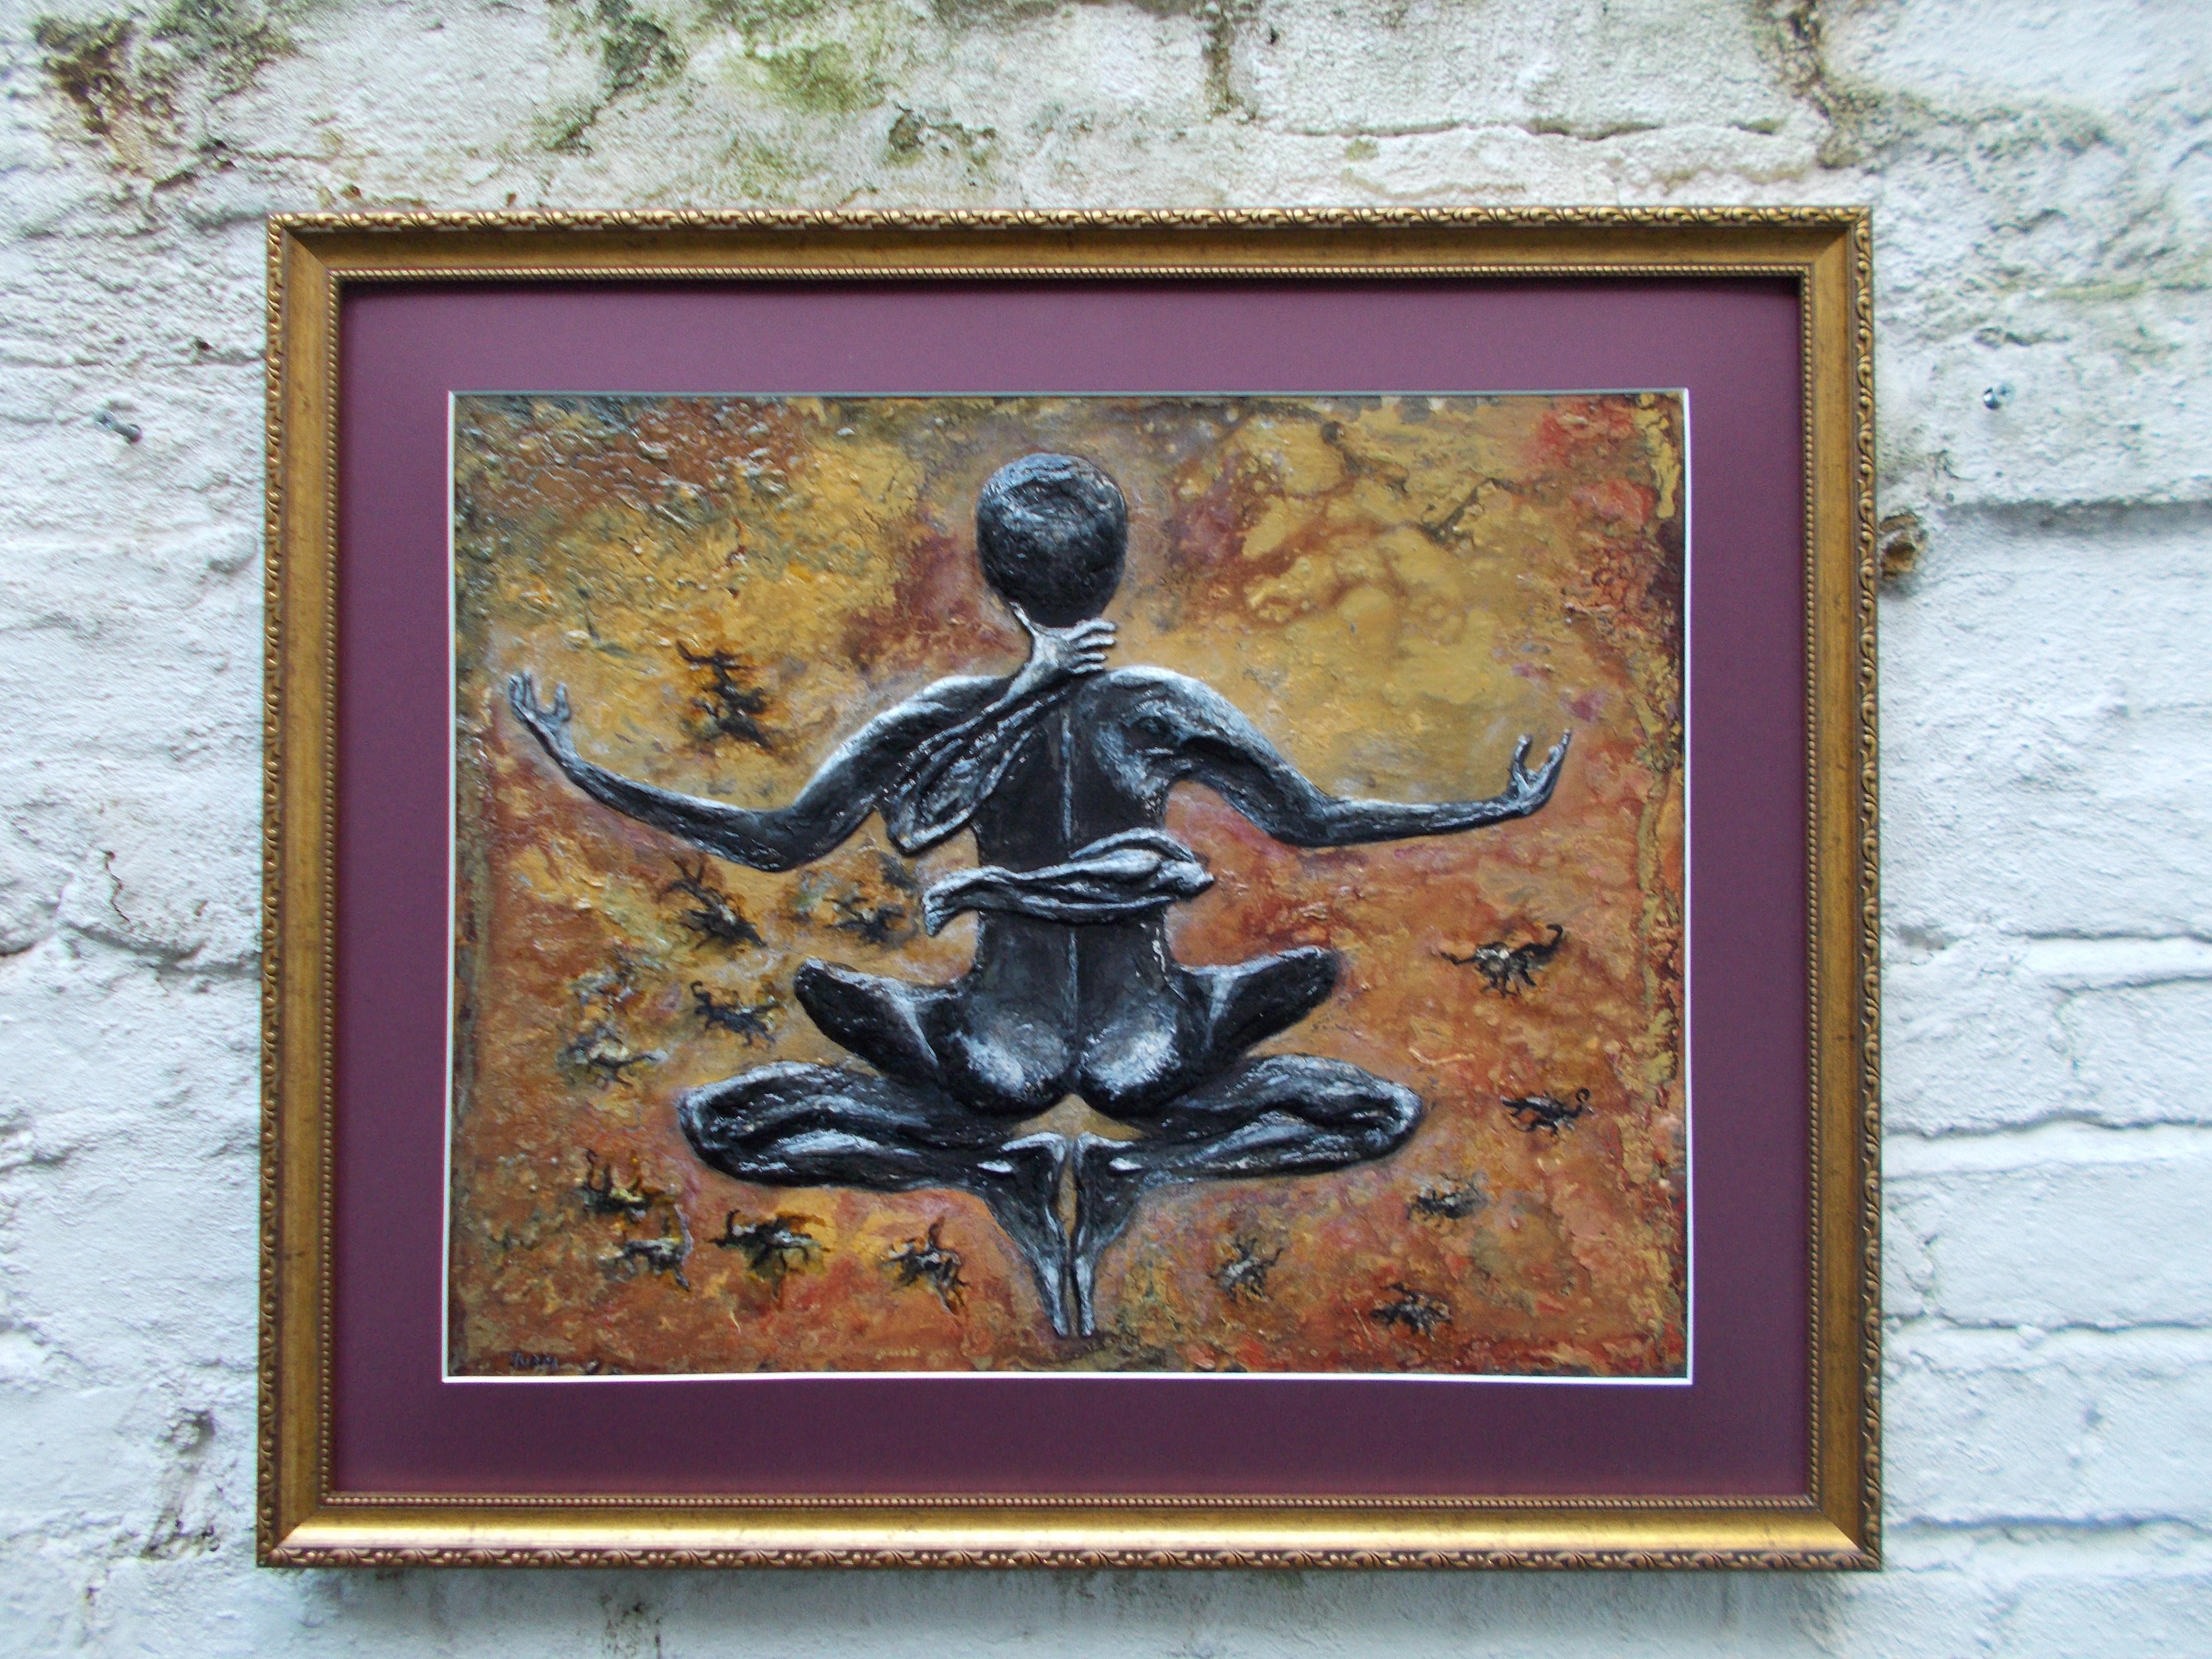 Scorpio-The-Scorpion-Oct 23-Nov 21-Jurita-2019-Painting Relief 3D-mixed-media-acrylic-clay-40x50cm© (9)